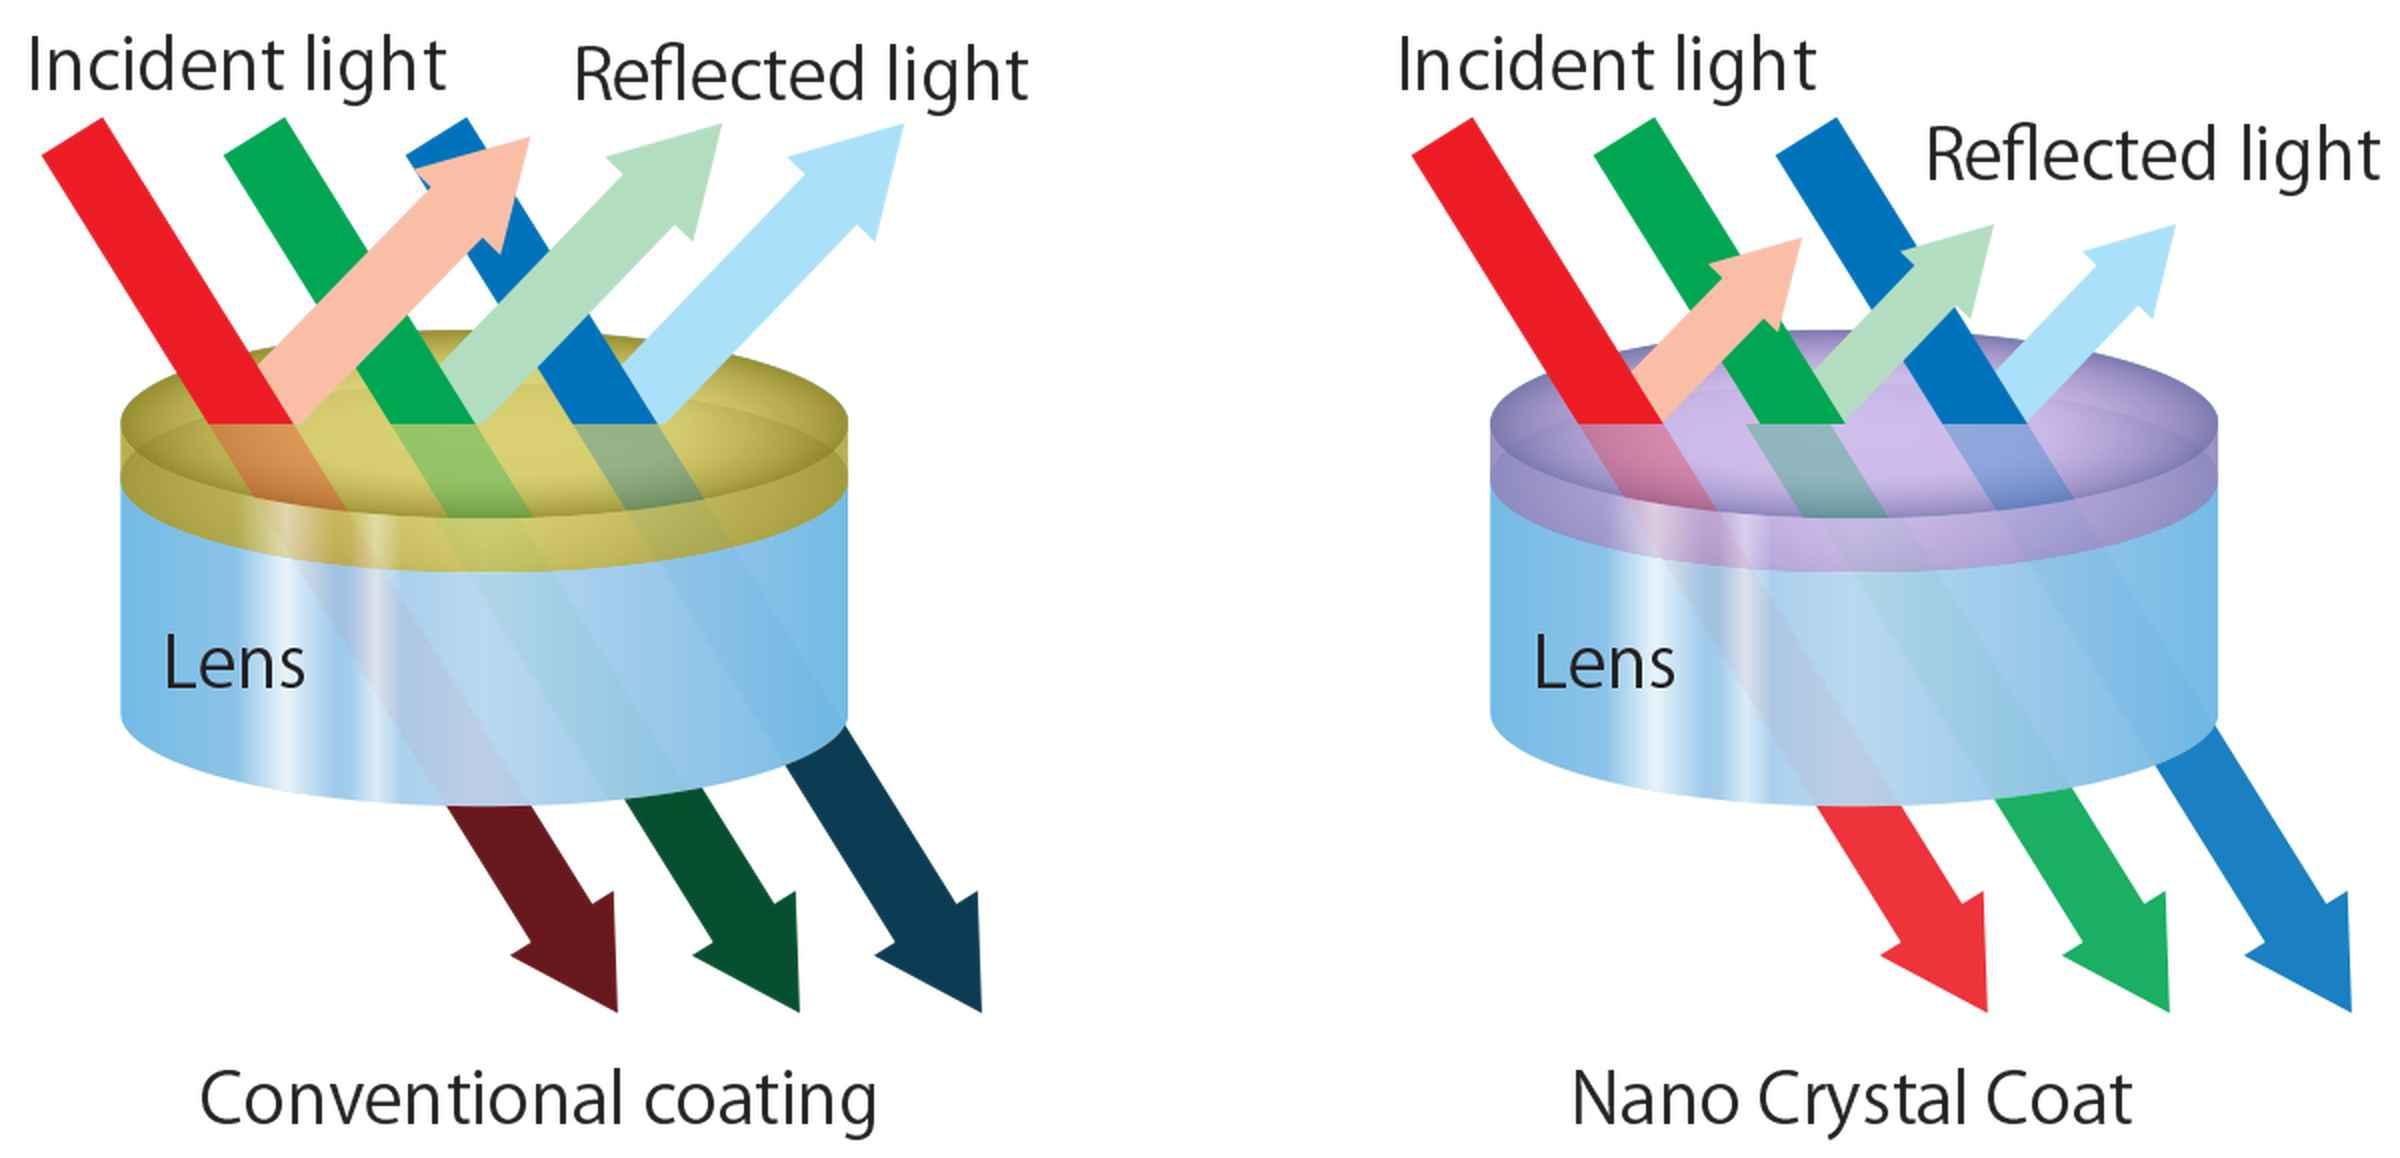 CFI Plan Apochromat Lambda Series   Optics   Products